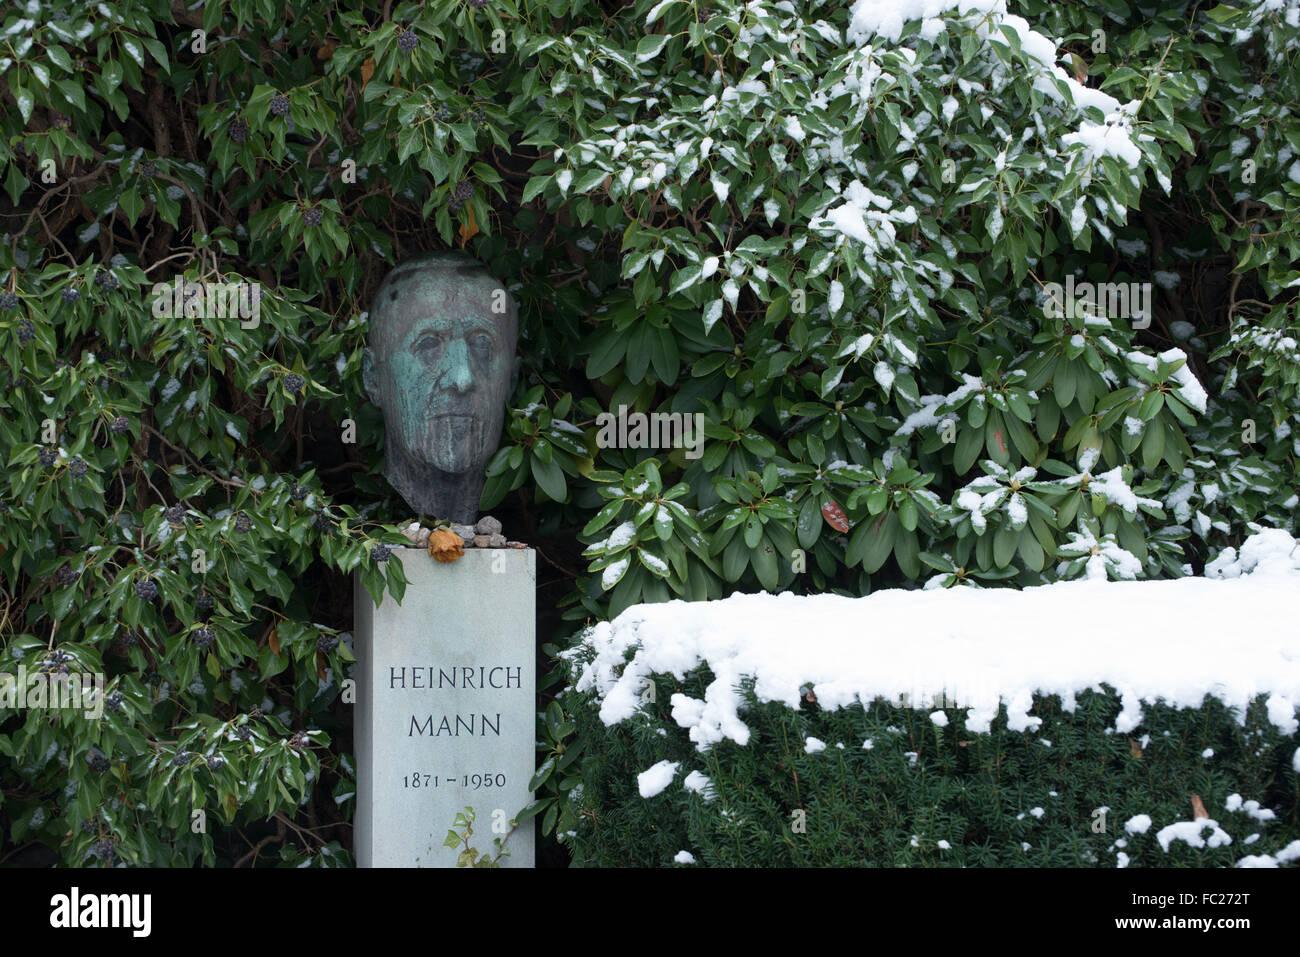 Dorotheenstadt cemetery Berlin,grave of Heinrich Mann, Germany - Stock Image